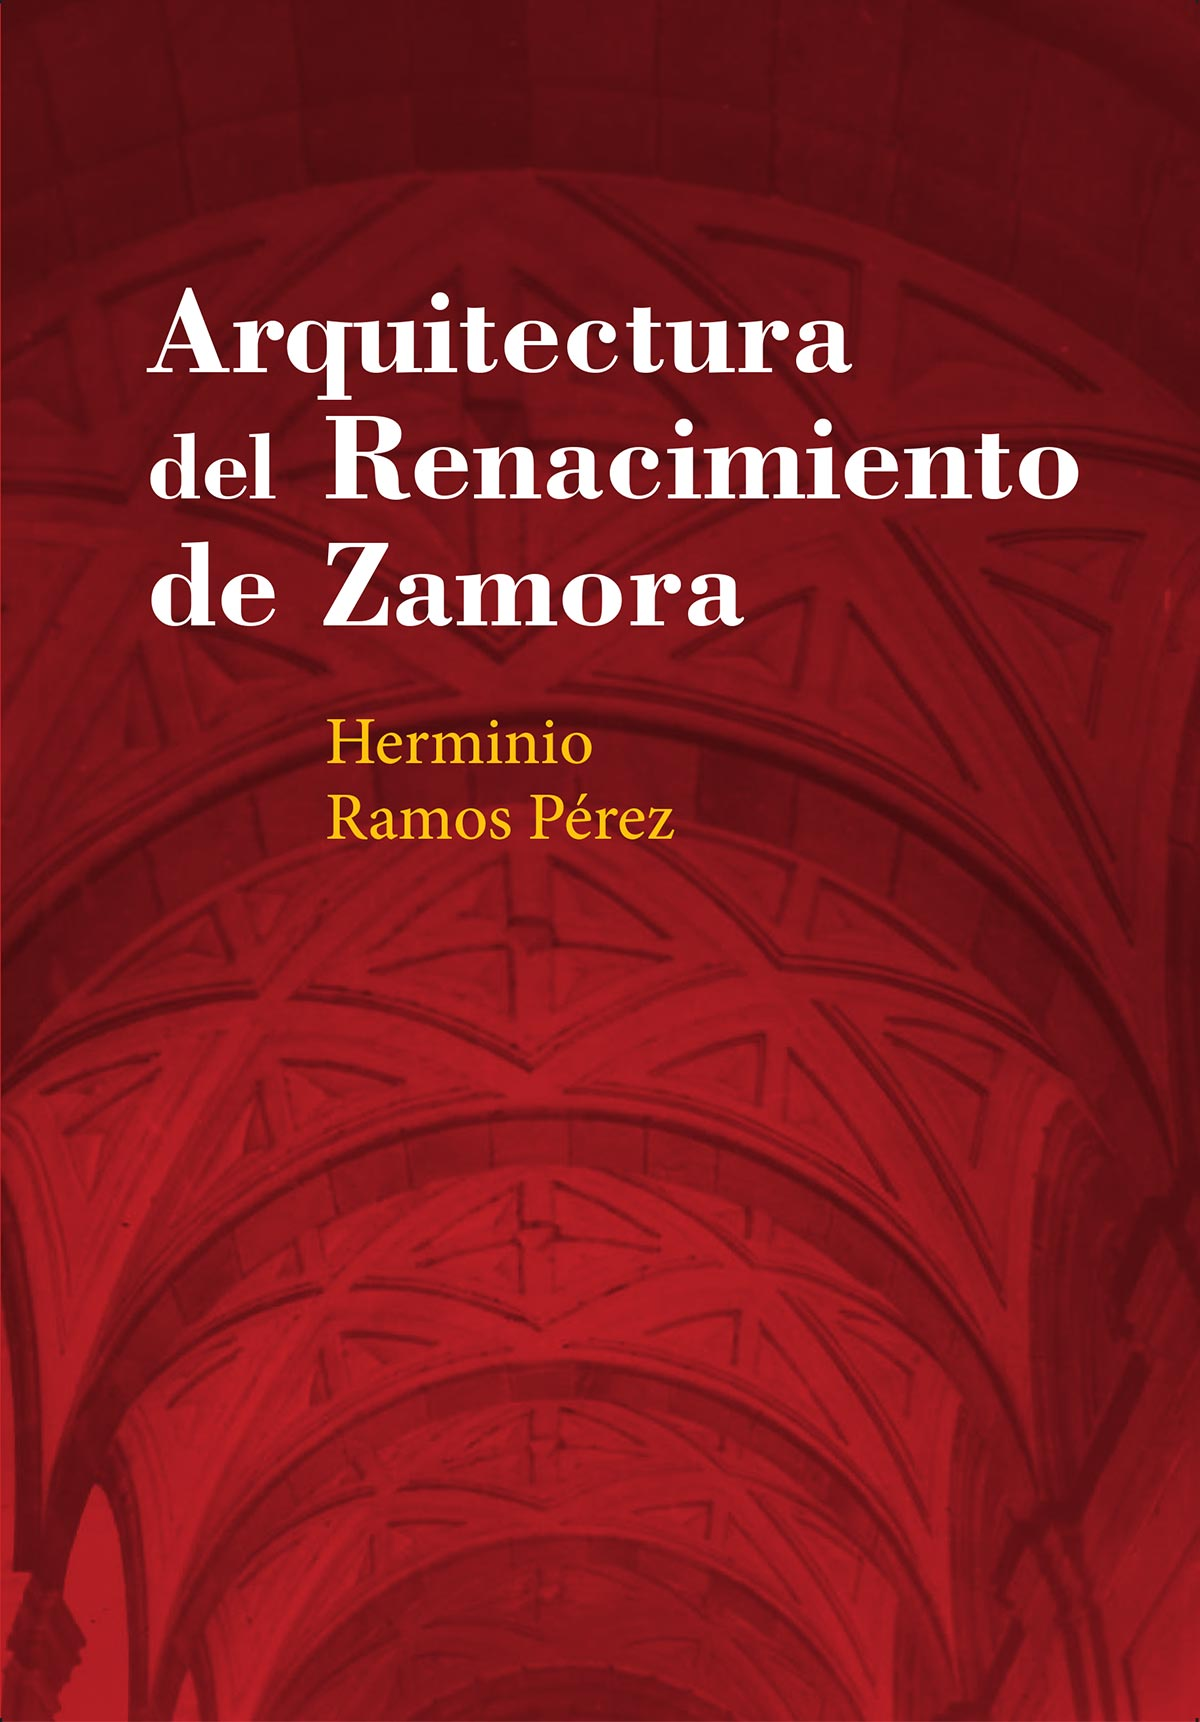 arquitectura renacimiento Zamora Herminio Ramos Perez Editorial Semuret